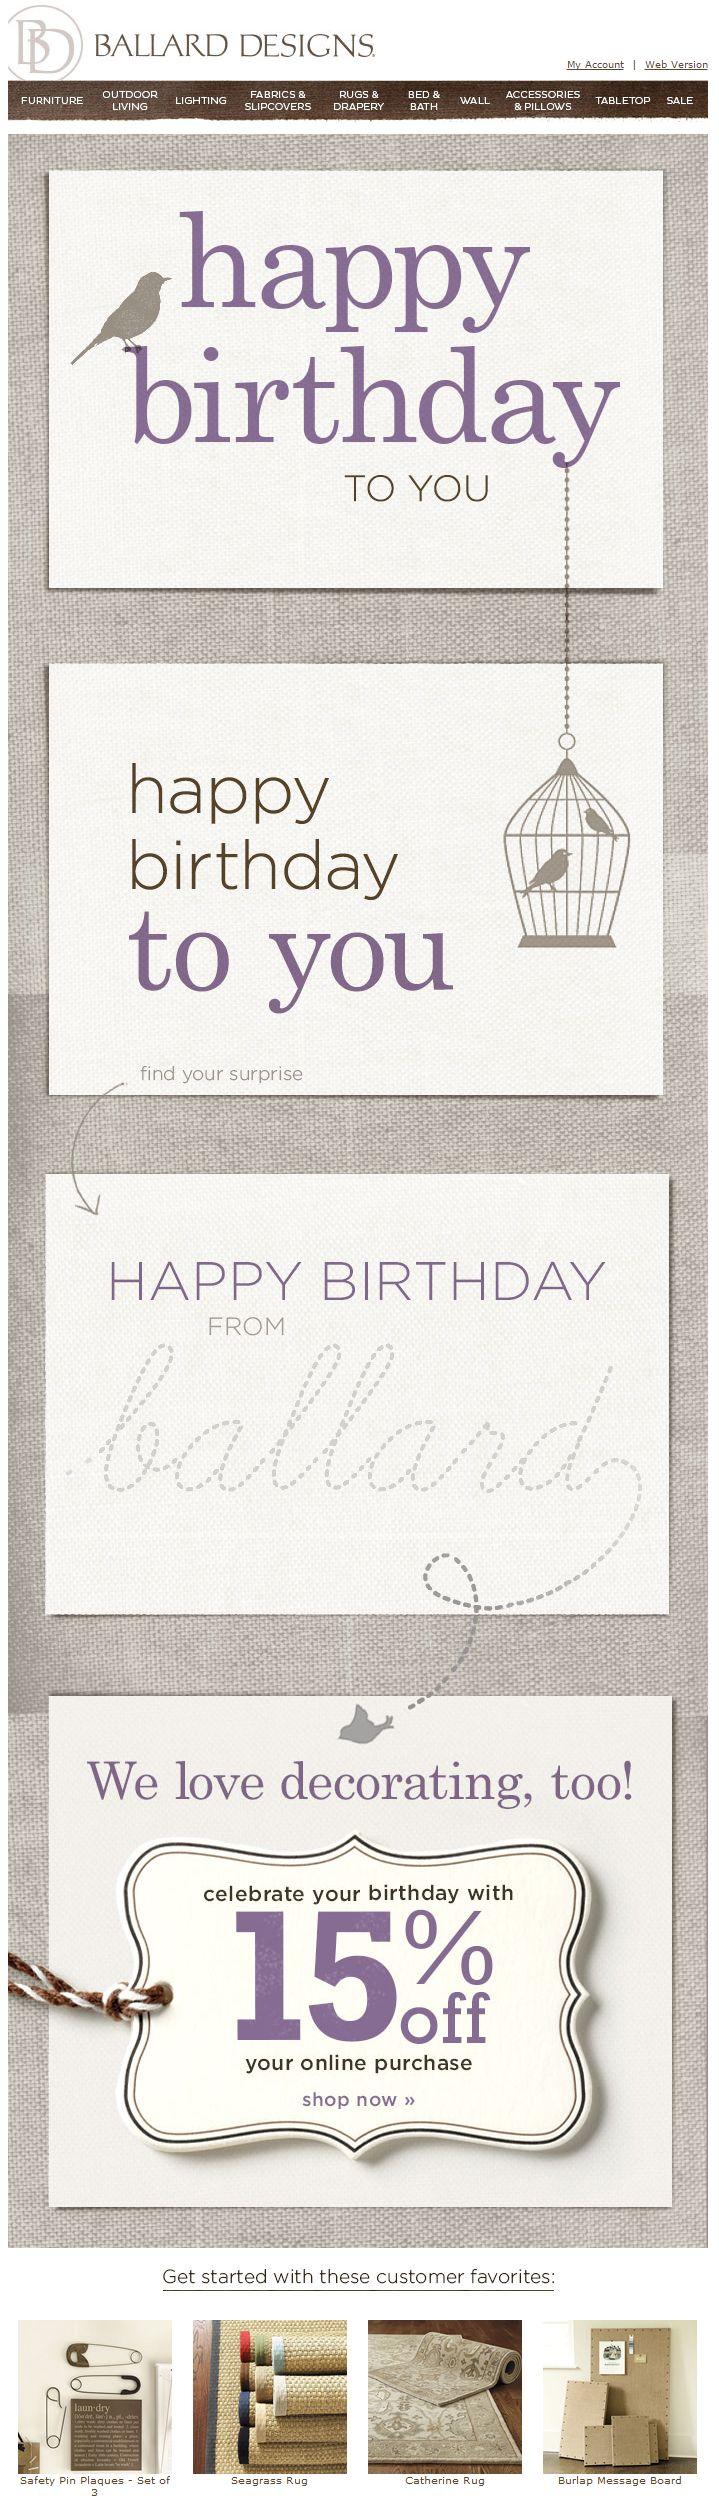 15 best trigger emails images on pinterest email design email ballard design birthday email